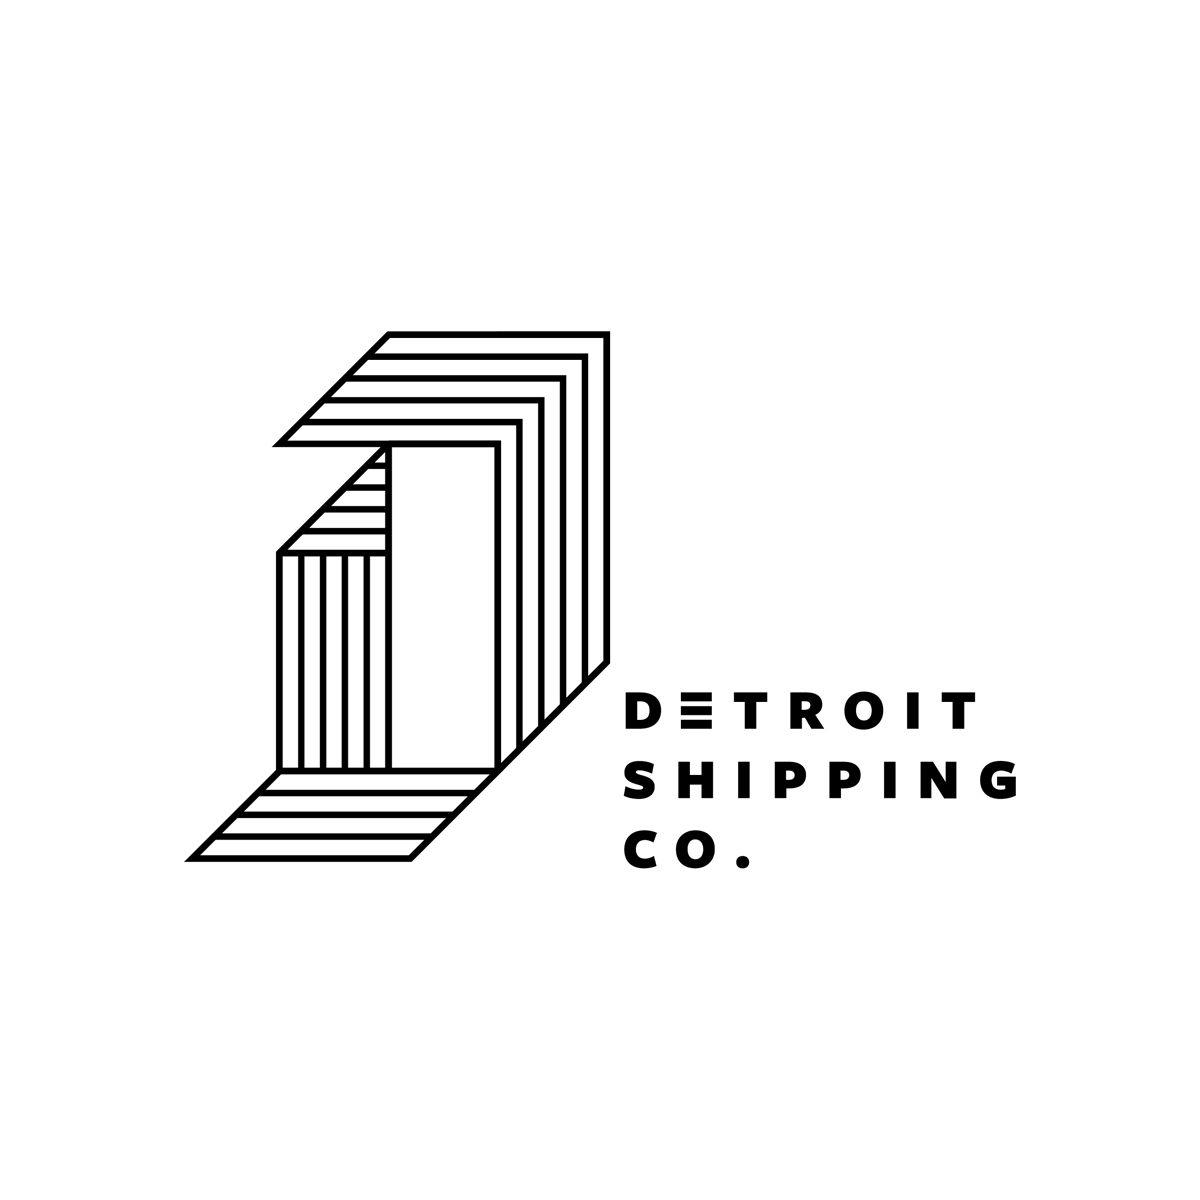 DetroitShippingCo-TOL-2019